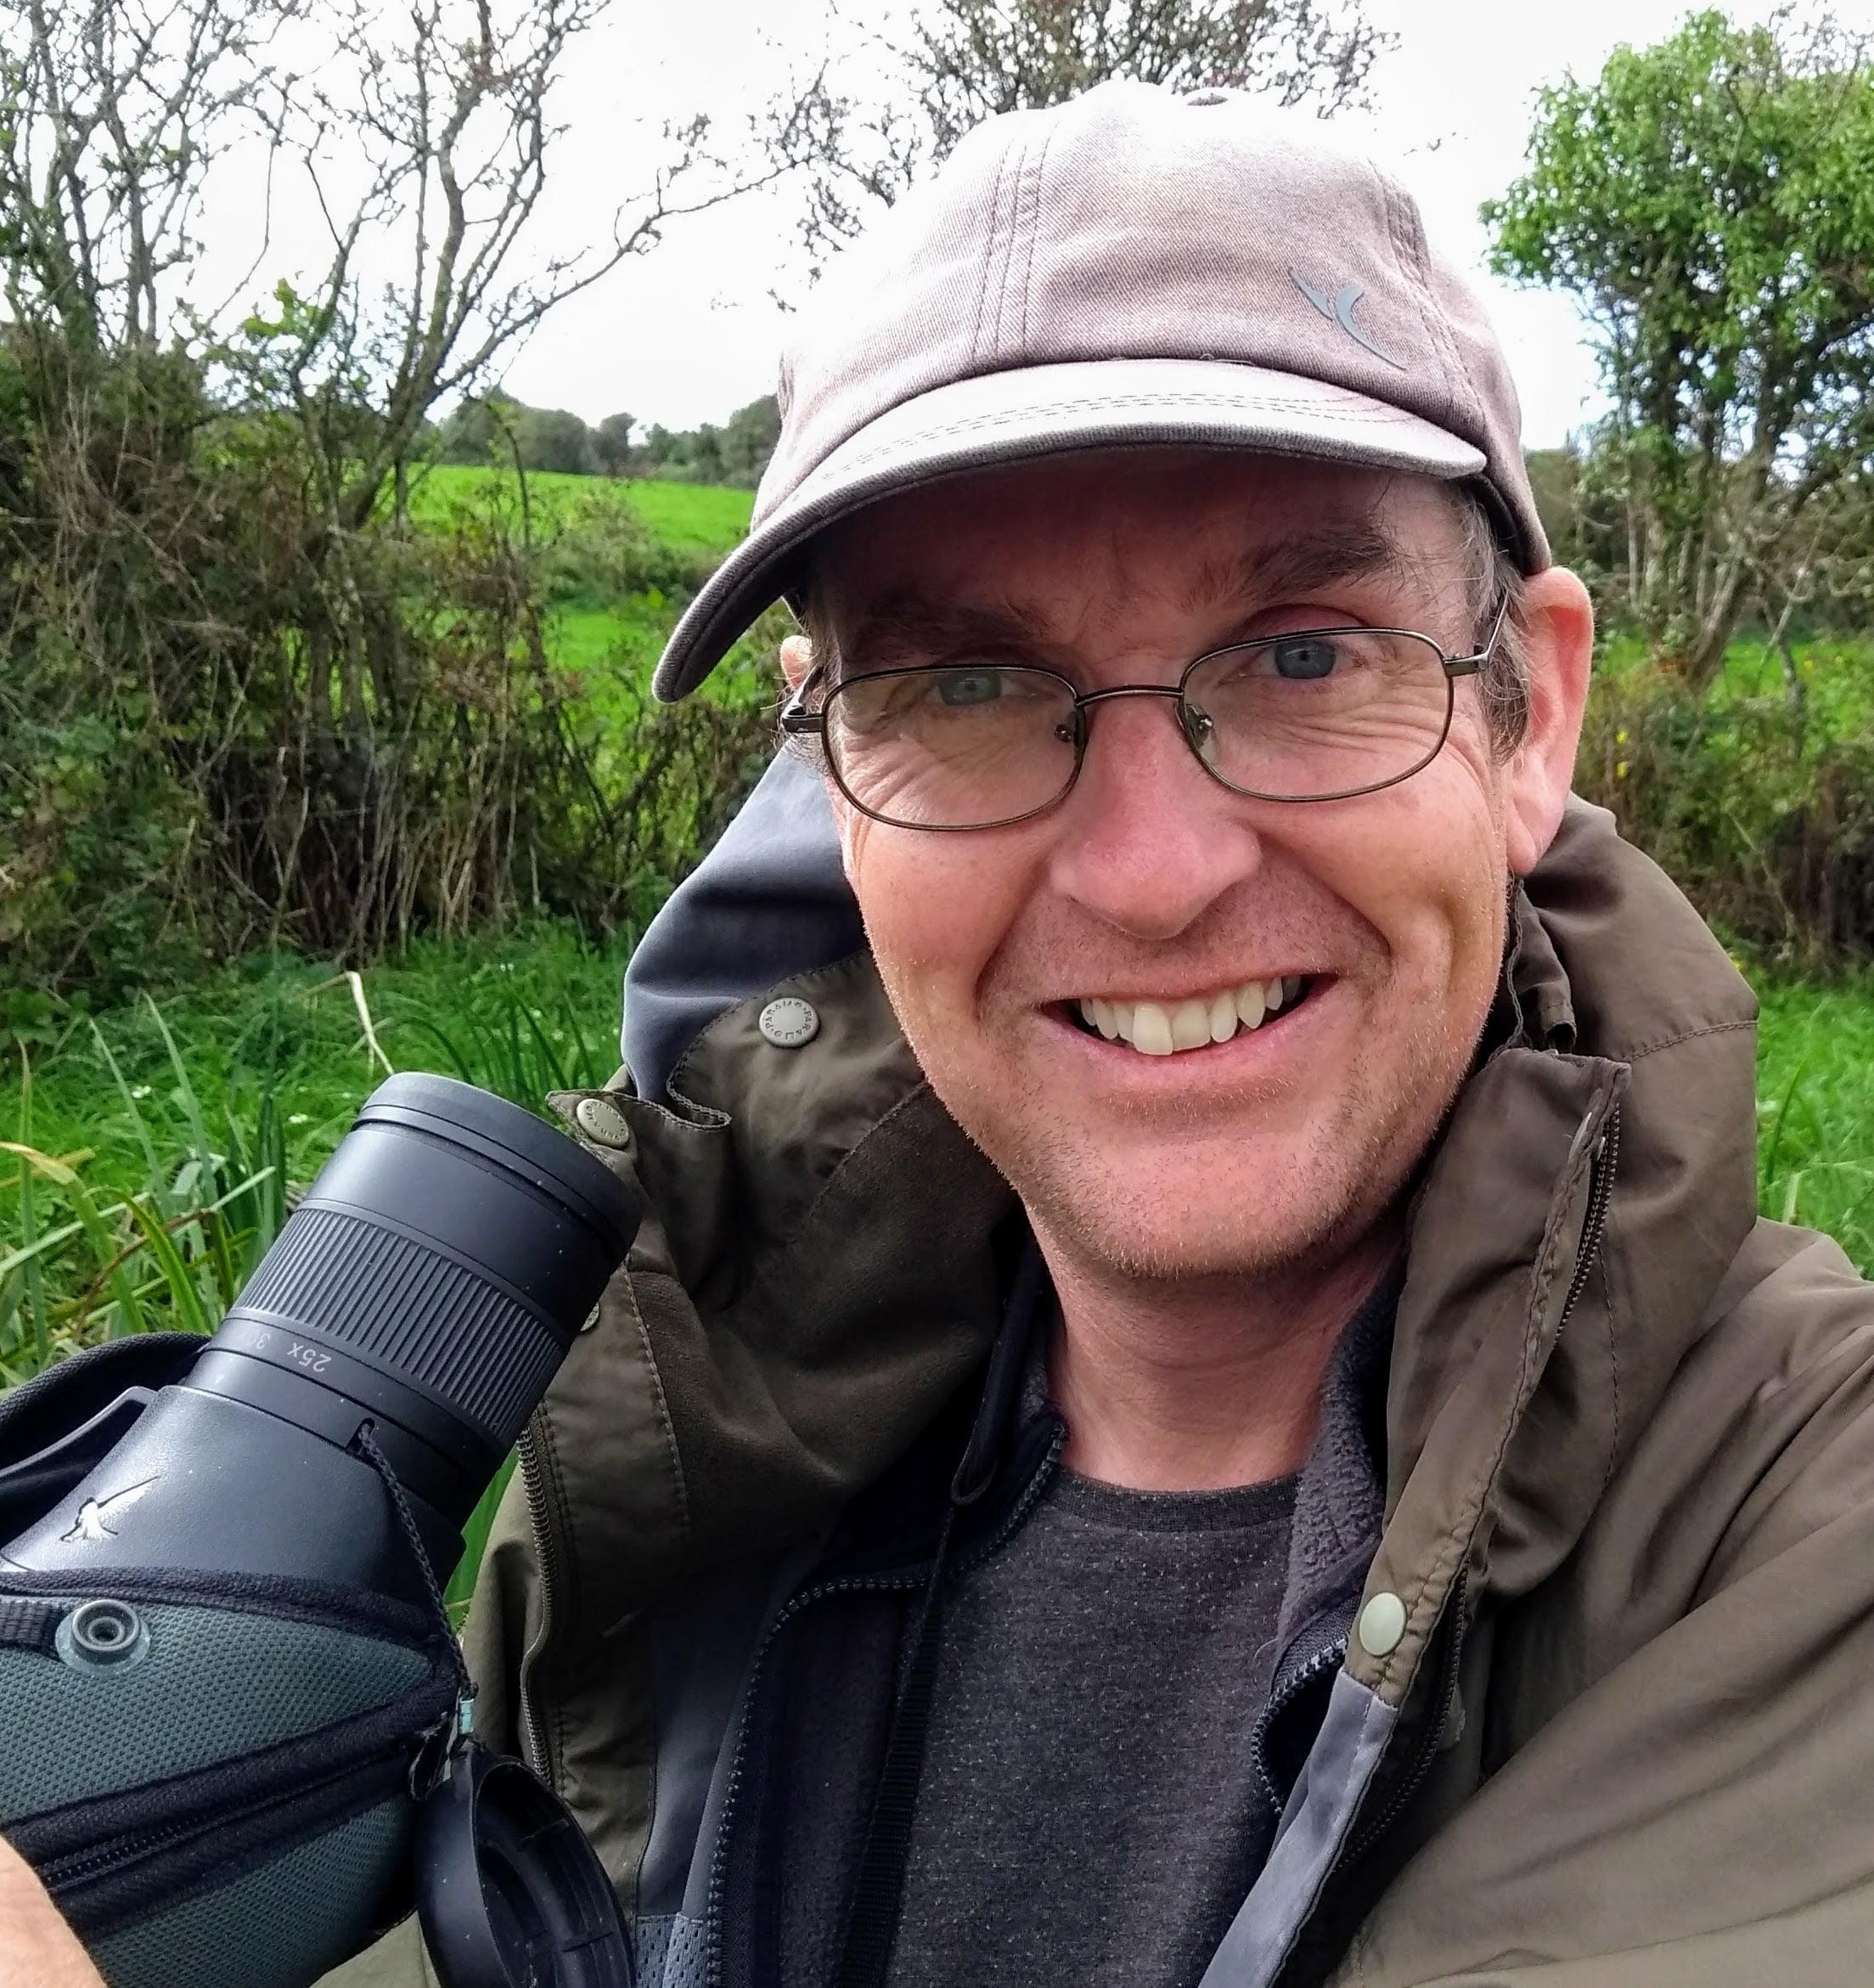 Professional Wildlife and Birding Guide Colin Barton